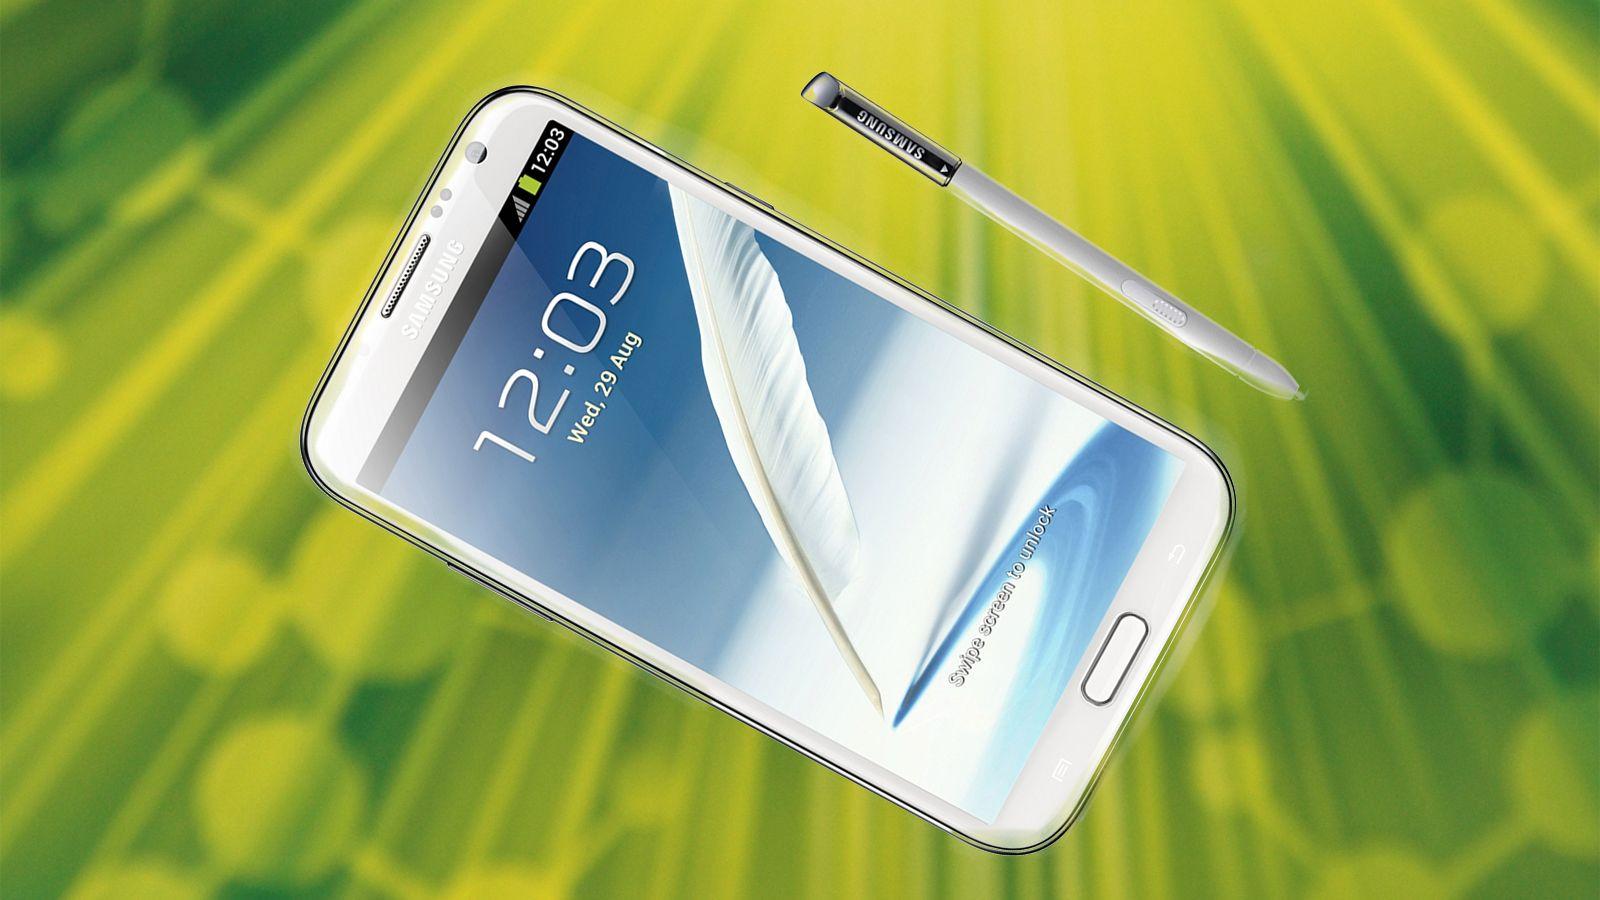 Vinn en Samsung Galaxy Note II